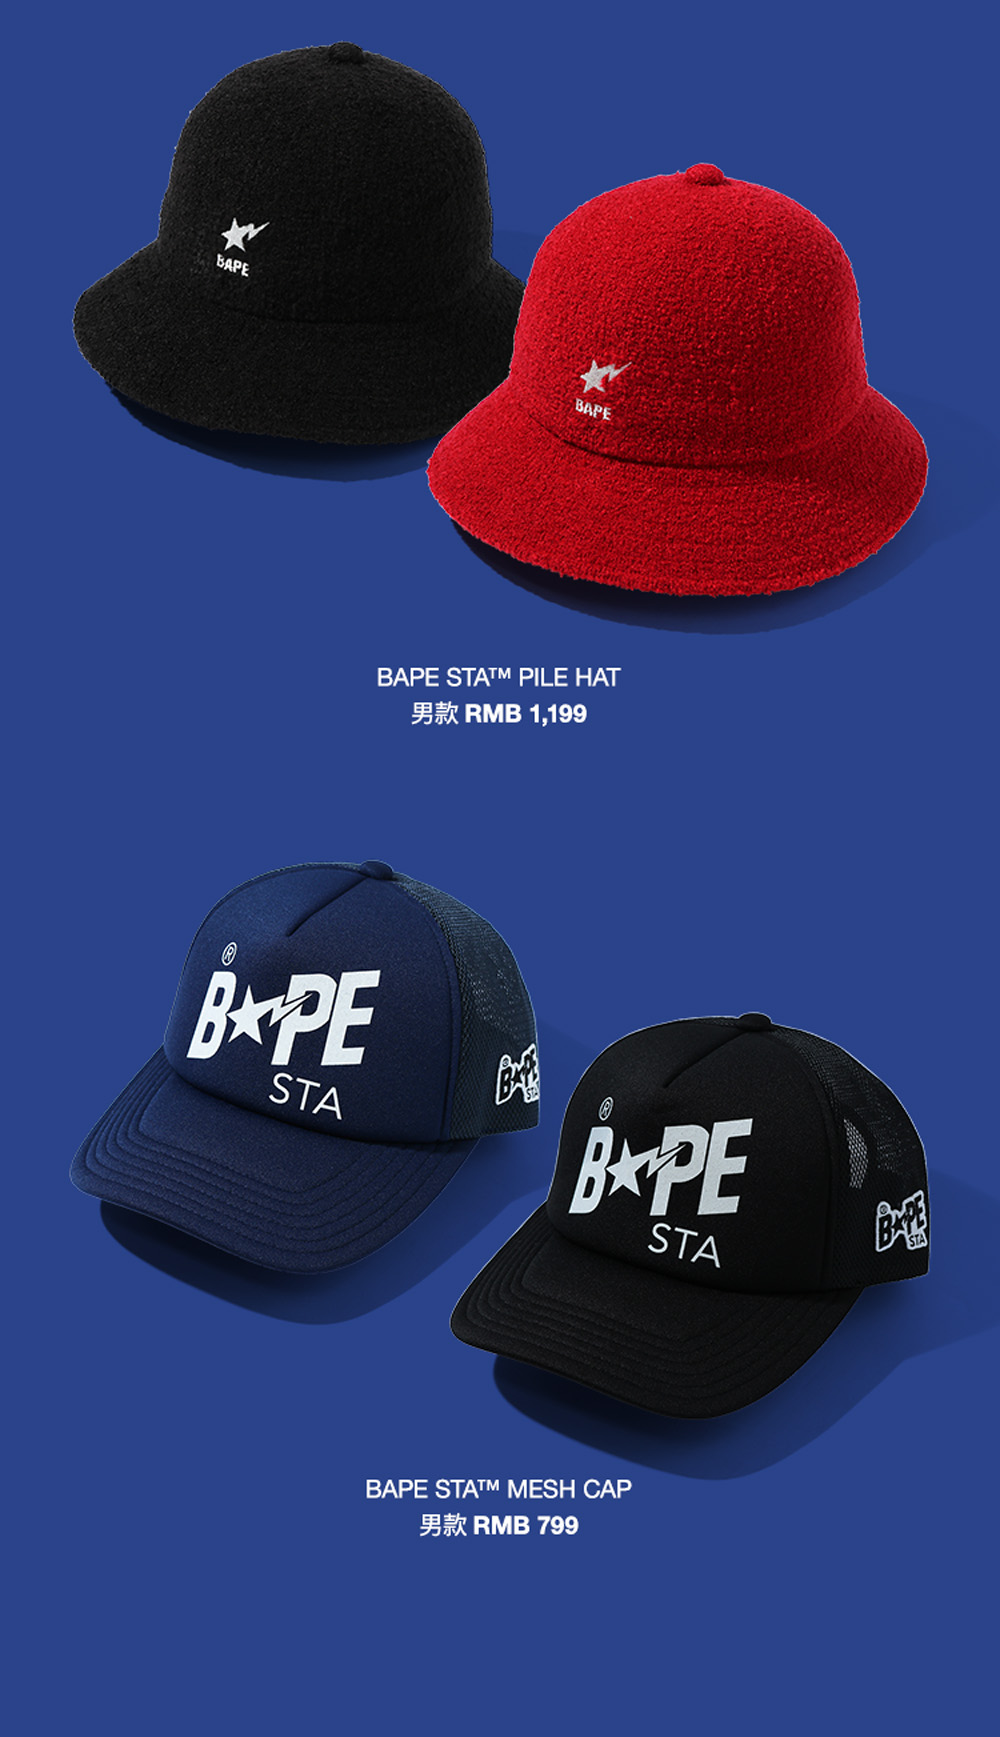 BAPE STA,BAPE,发售  近期球鞋圈黑马!BAPE STA 新配色明天发售!这次别错过!